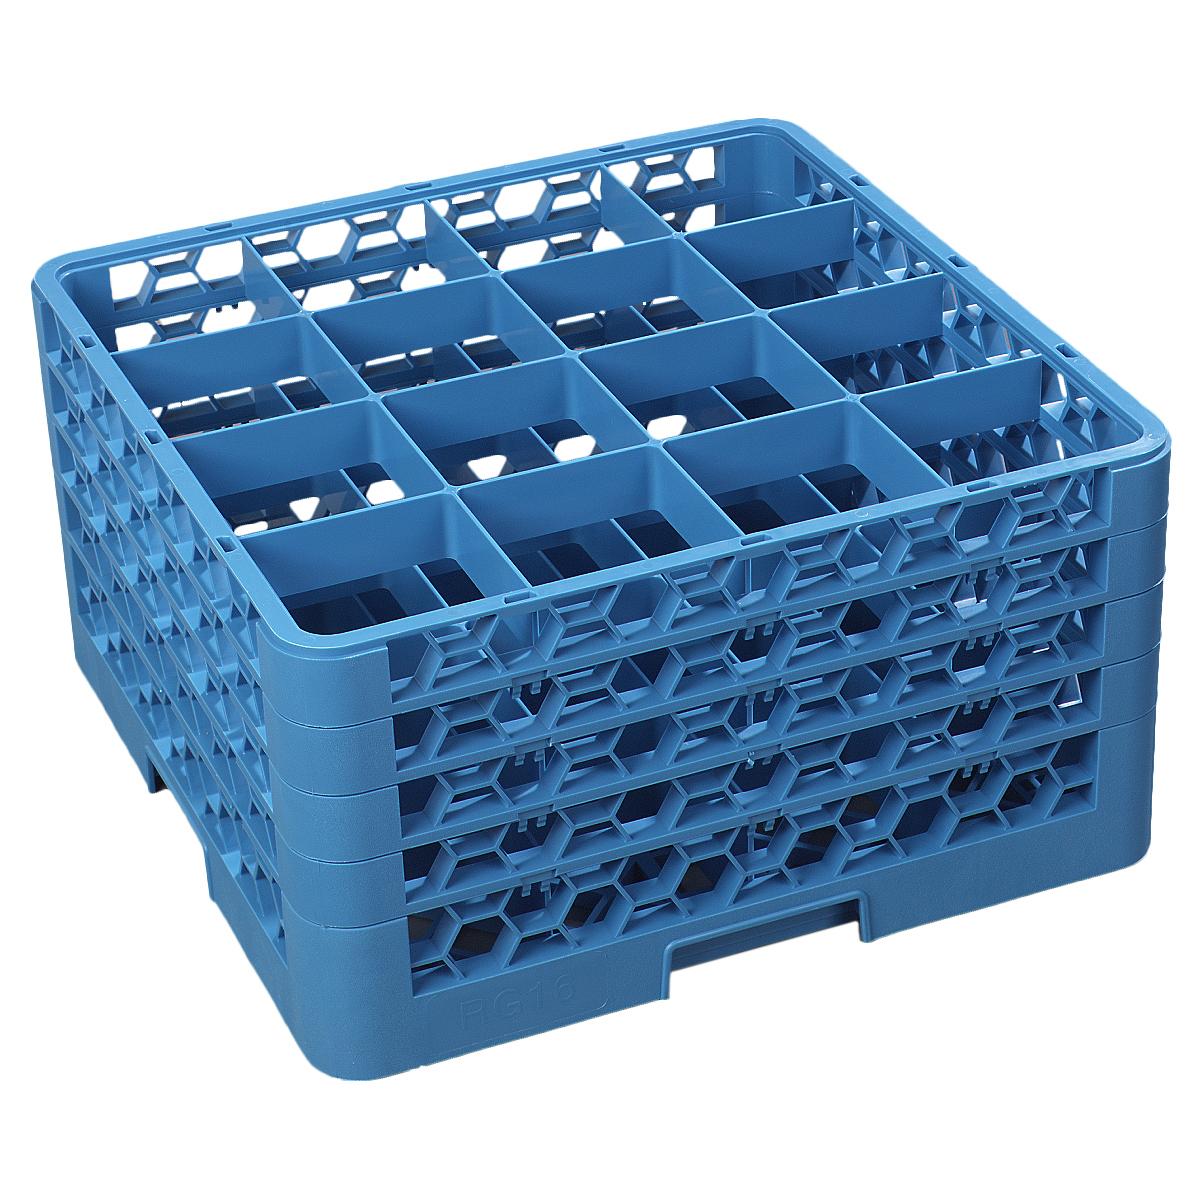 Carlisle RG16-414 dishwasher rack, glass compartment